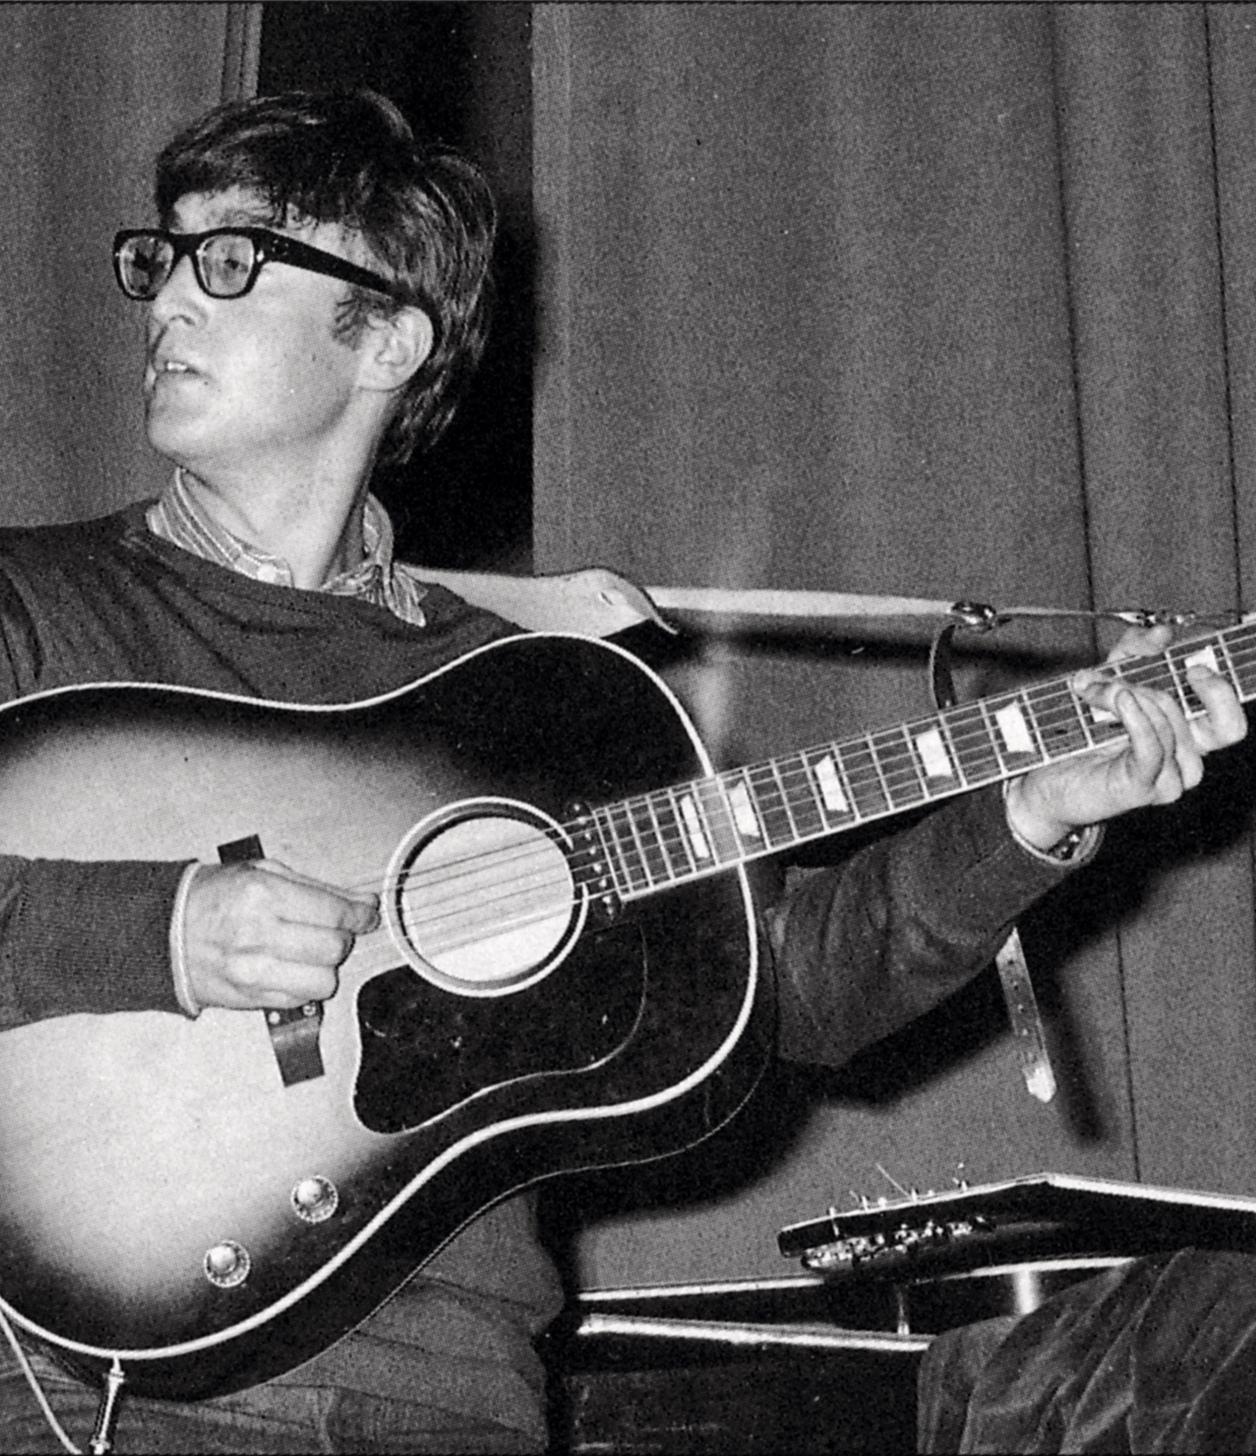 John Lennon with his 1962 Gibson J-160E and Selmer strap.